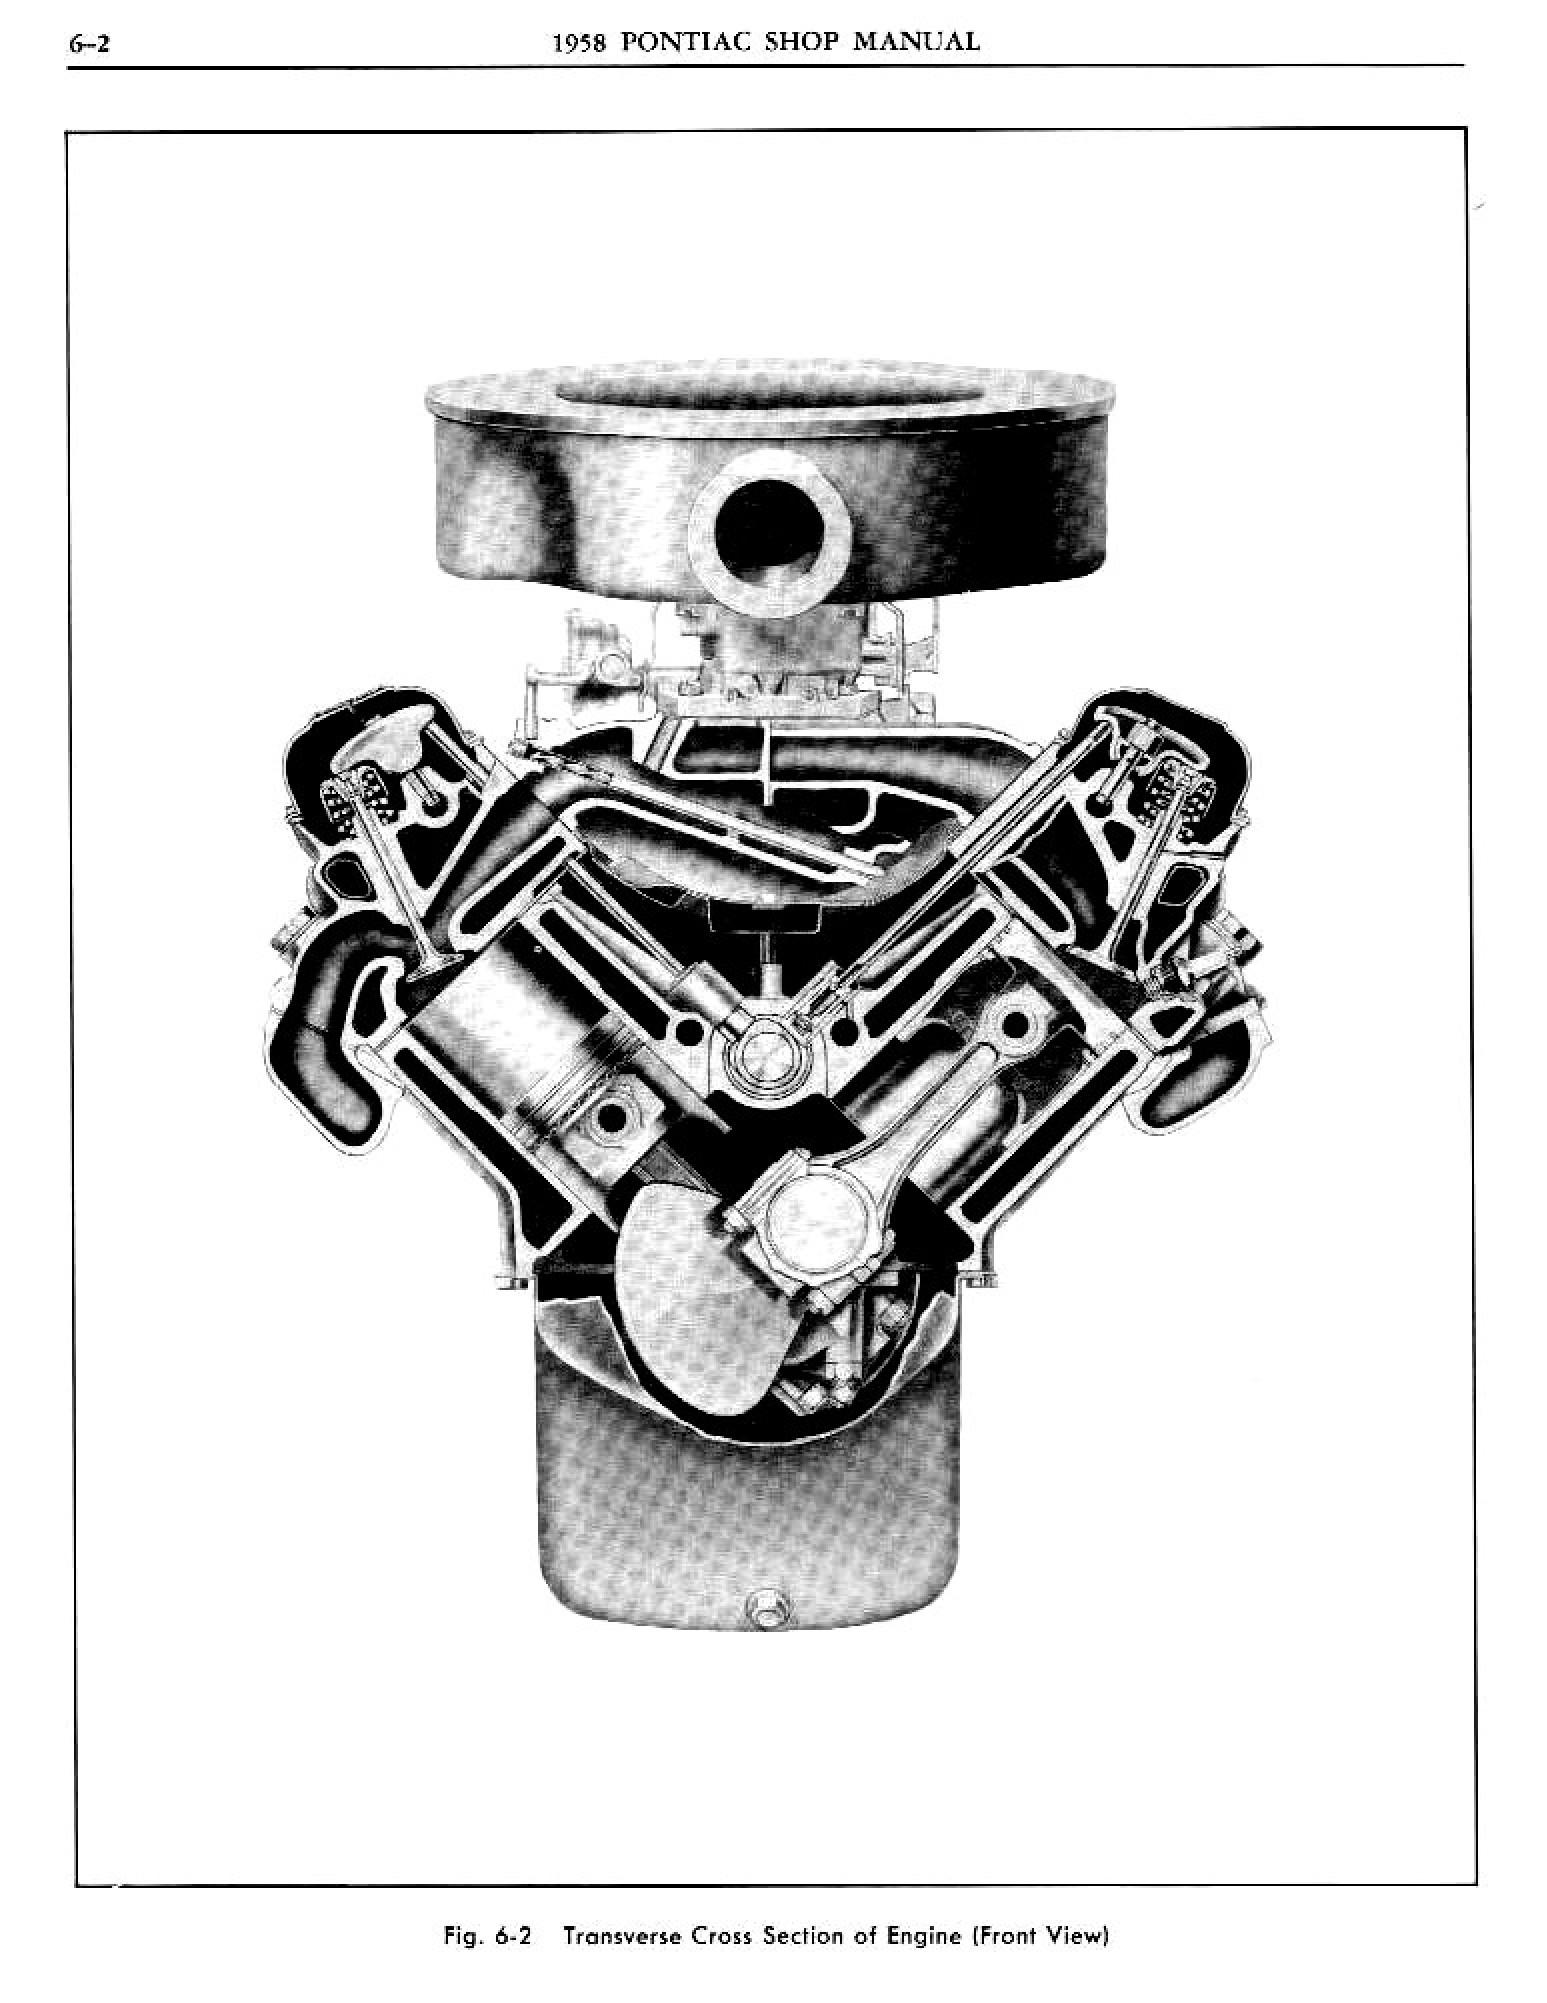 1958 Pontiac Shop Manual- Engine Page 3 of 51